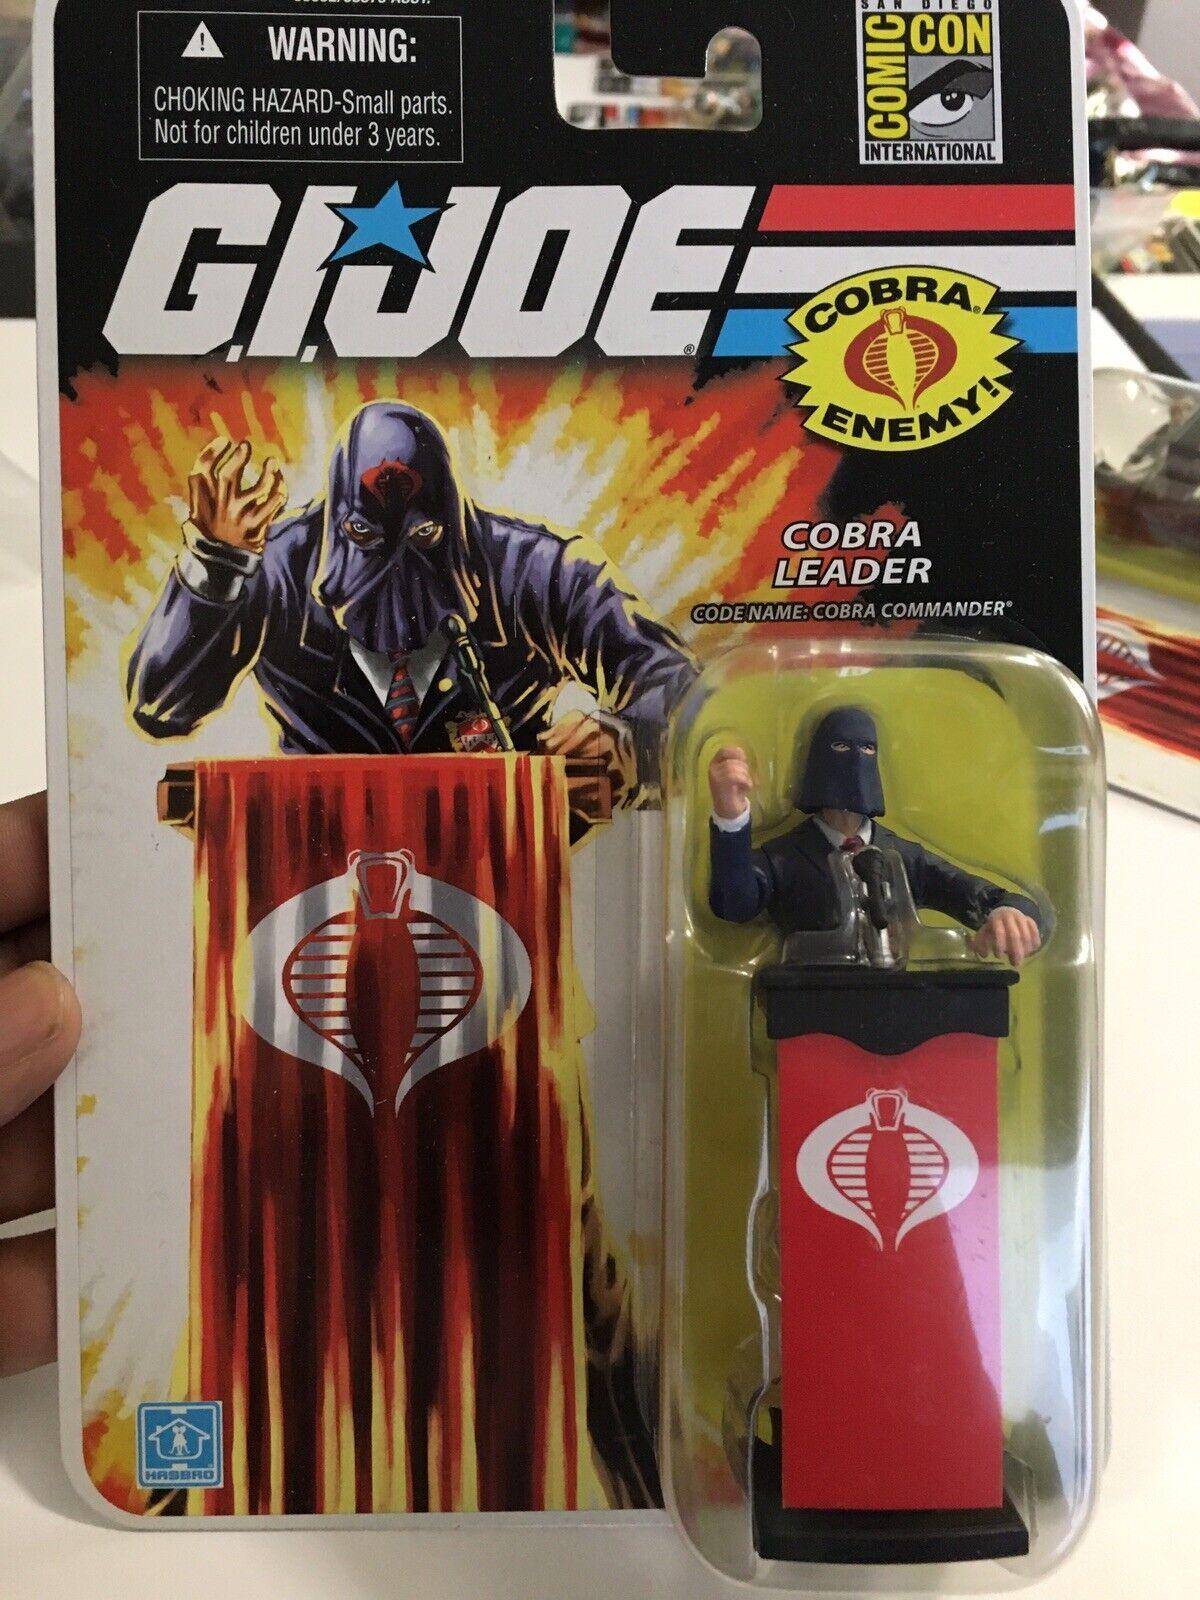 GI Joe 2008 SAN DIEGO comic-con Exclusive Cobra Commander Costume Bleu Comme neuf on Card Rare LIVRAISON GRATUITE